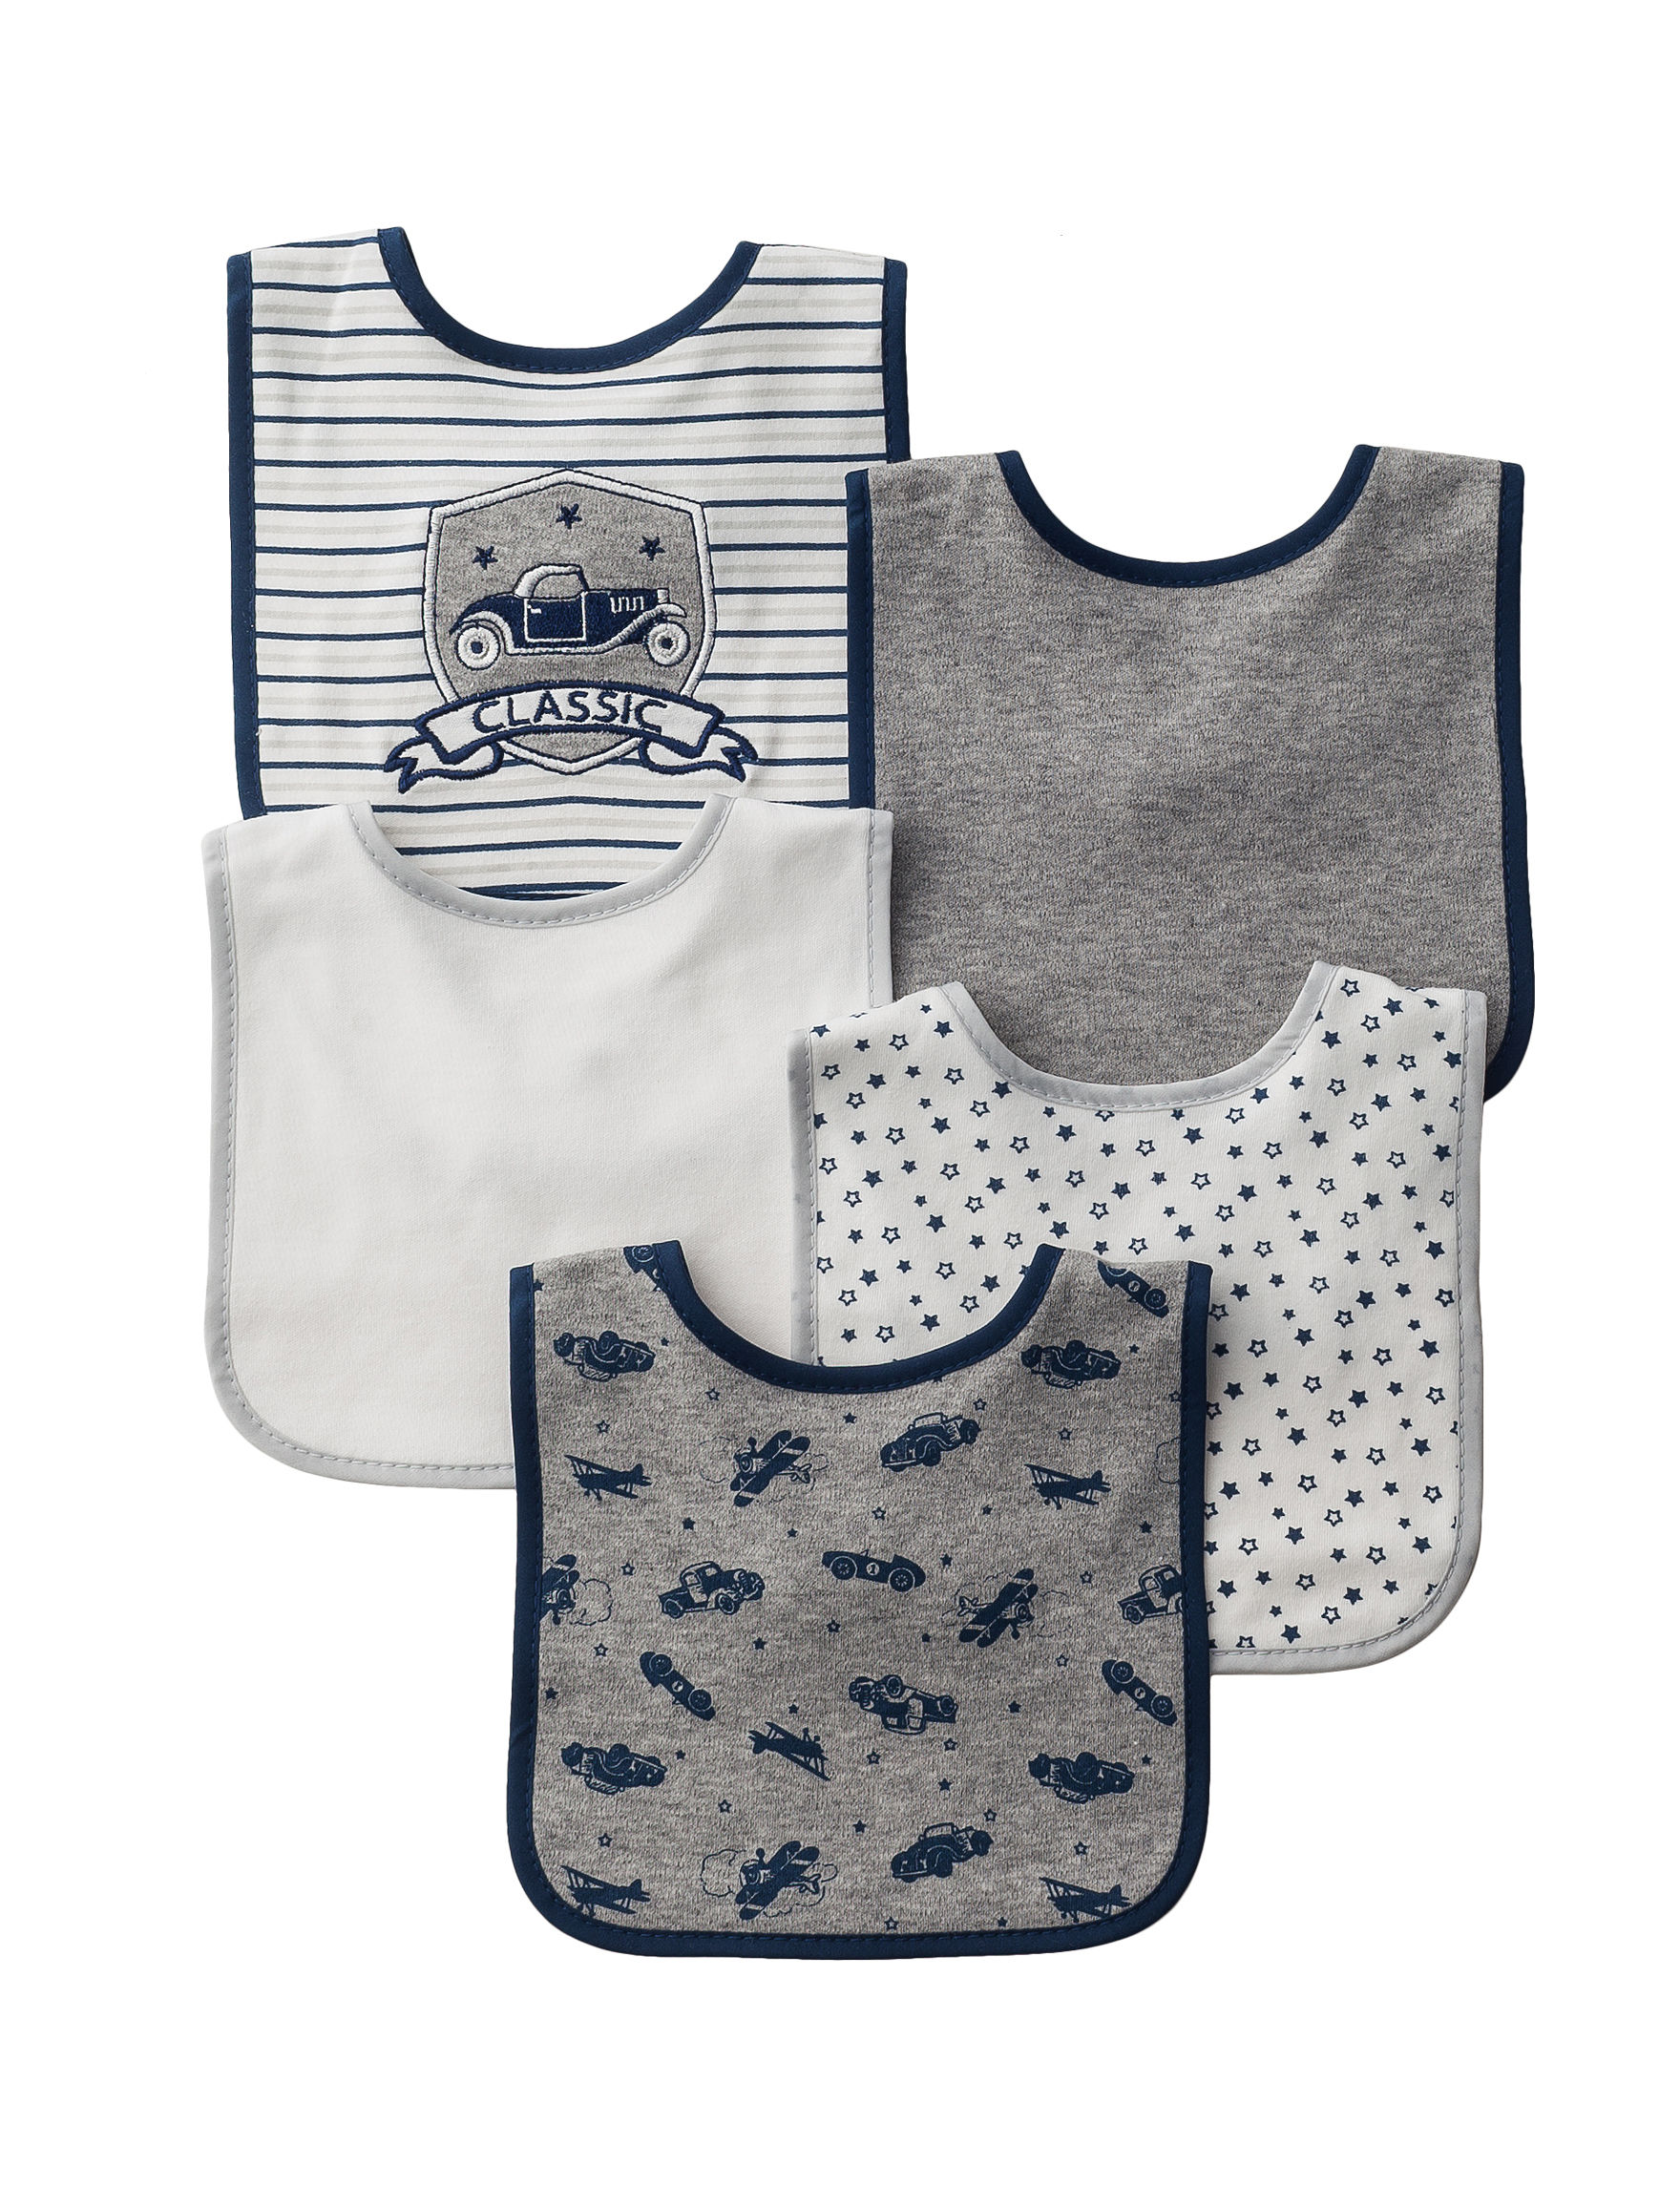 Kyle & Deena Navy Bibs & Burp Cloths